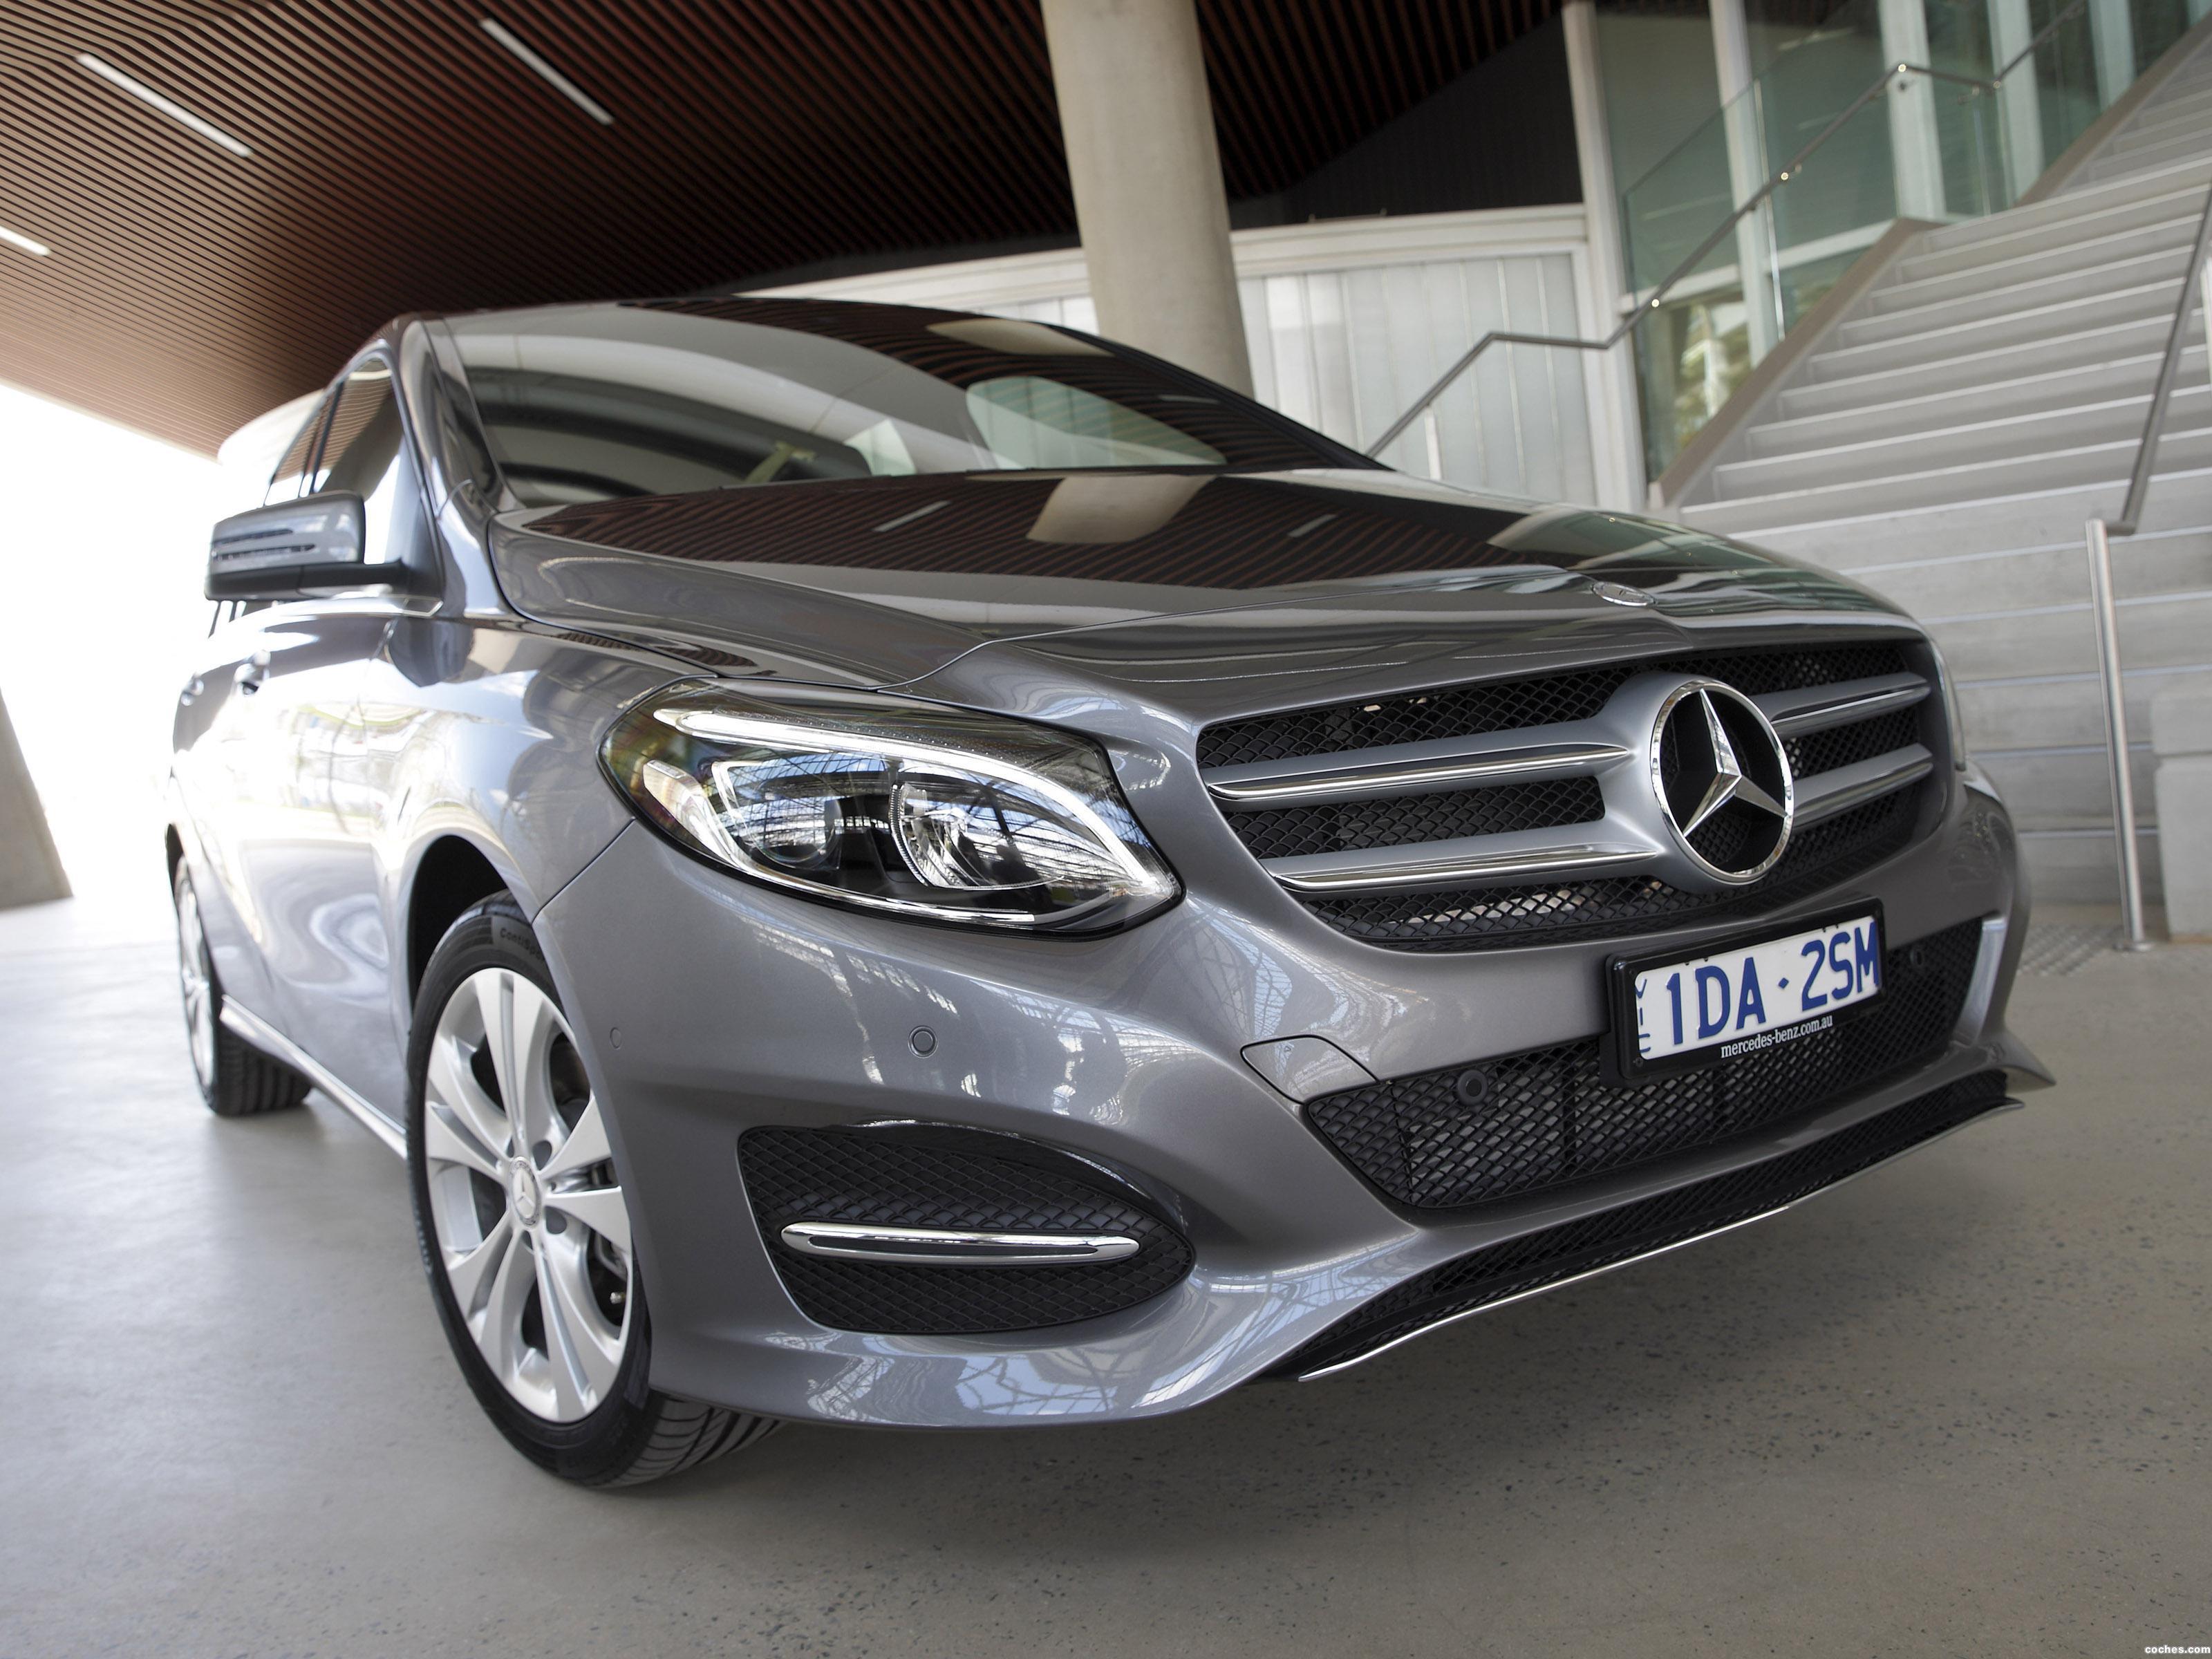 mercedes_b-klasse-b200-urban-line-w246-australia-2015_r28.jpg